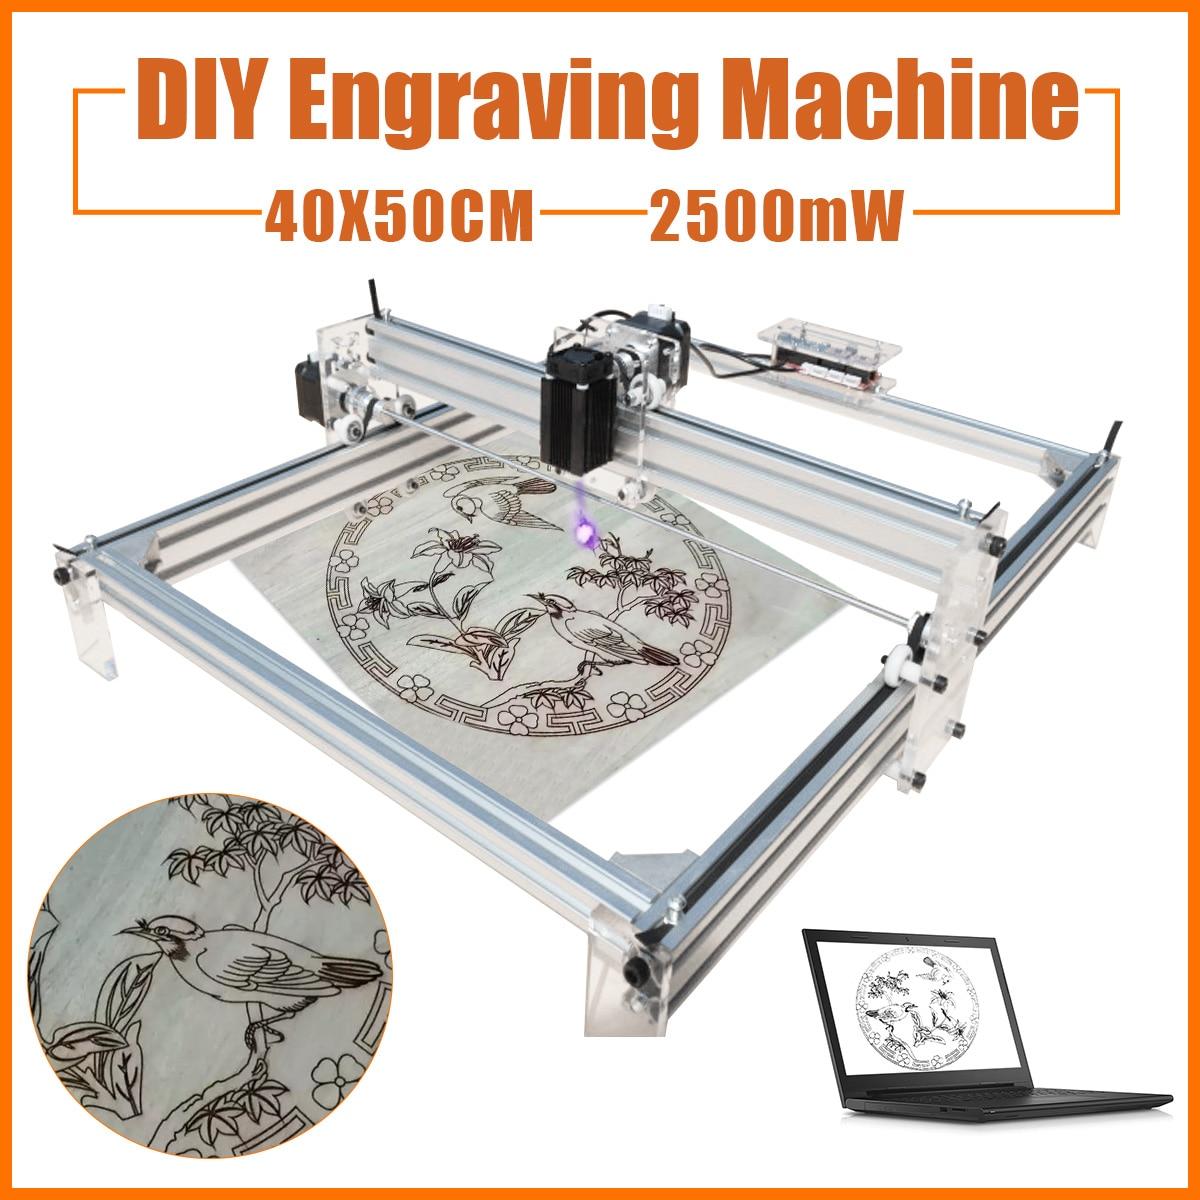 2500mW DC 12V 40X50CM DIY Desktop Mini Laser Cutting/Engraving Machine Printer Carving with Laser Goggles